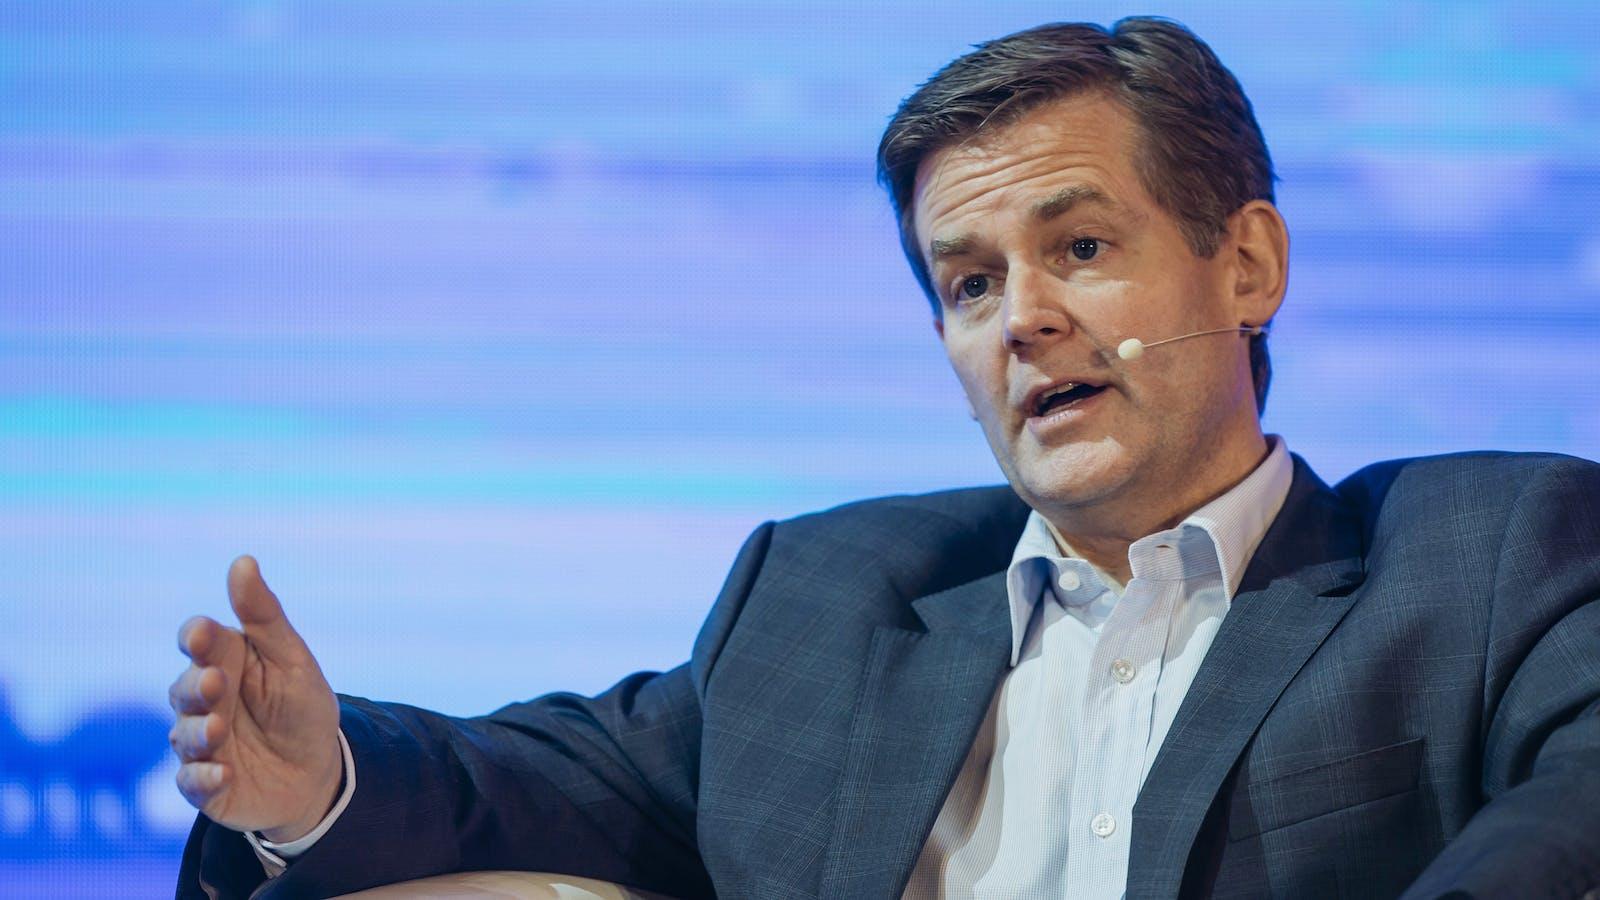 Douglas Feagin, Ant's senior vice president. Photo by Bloomberg.